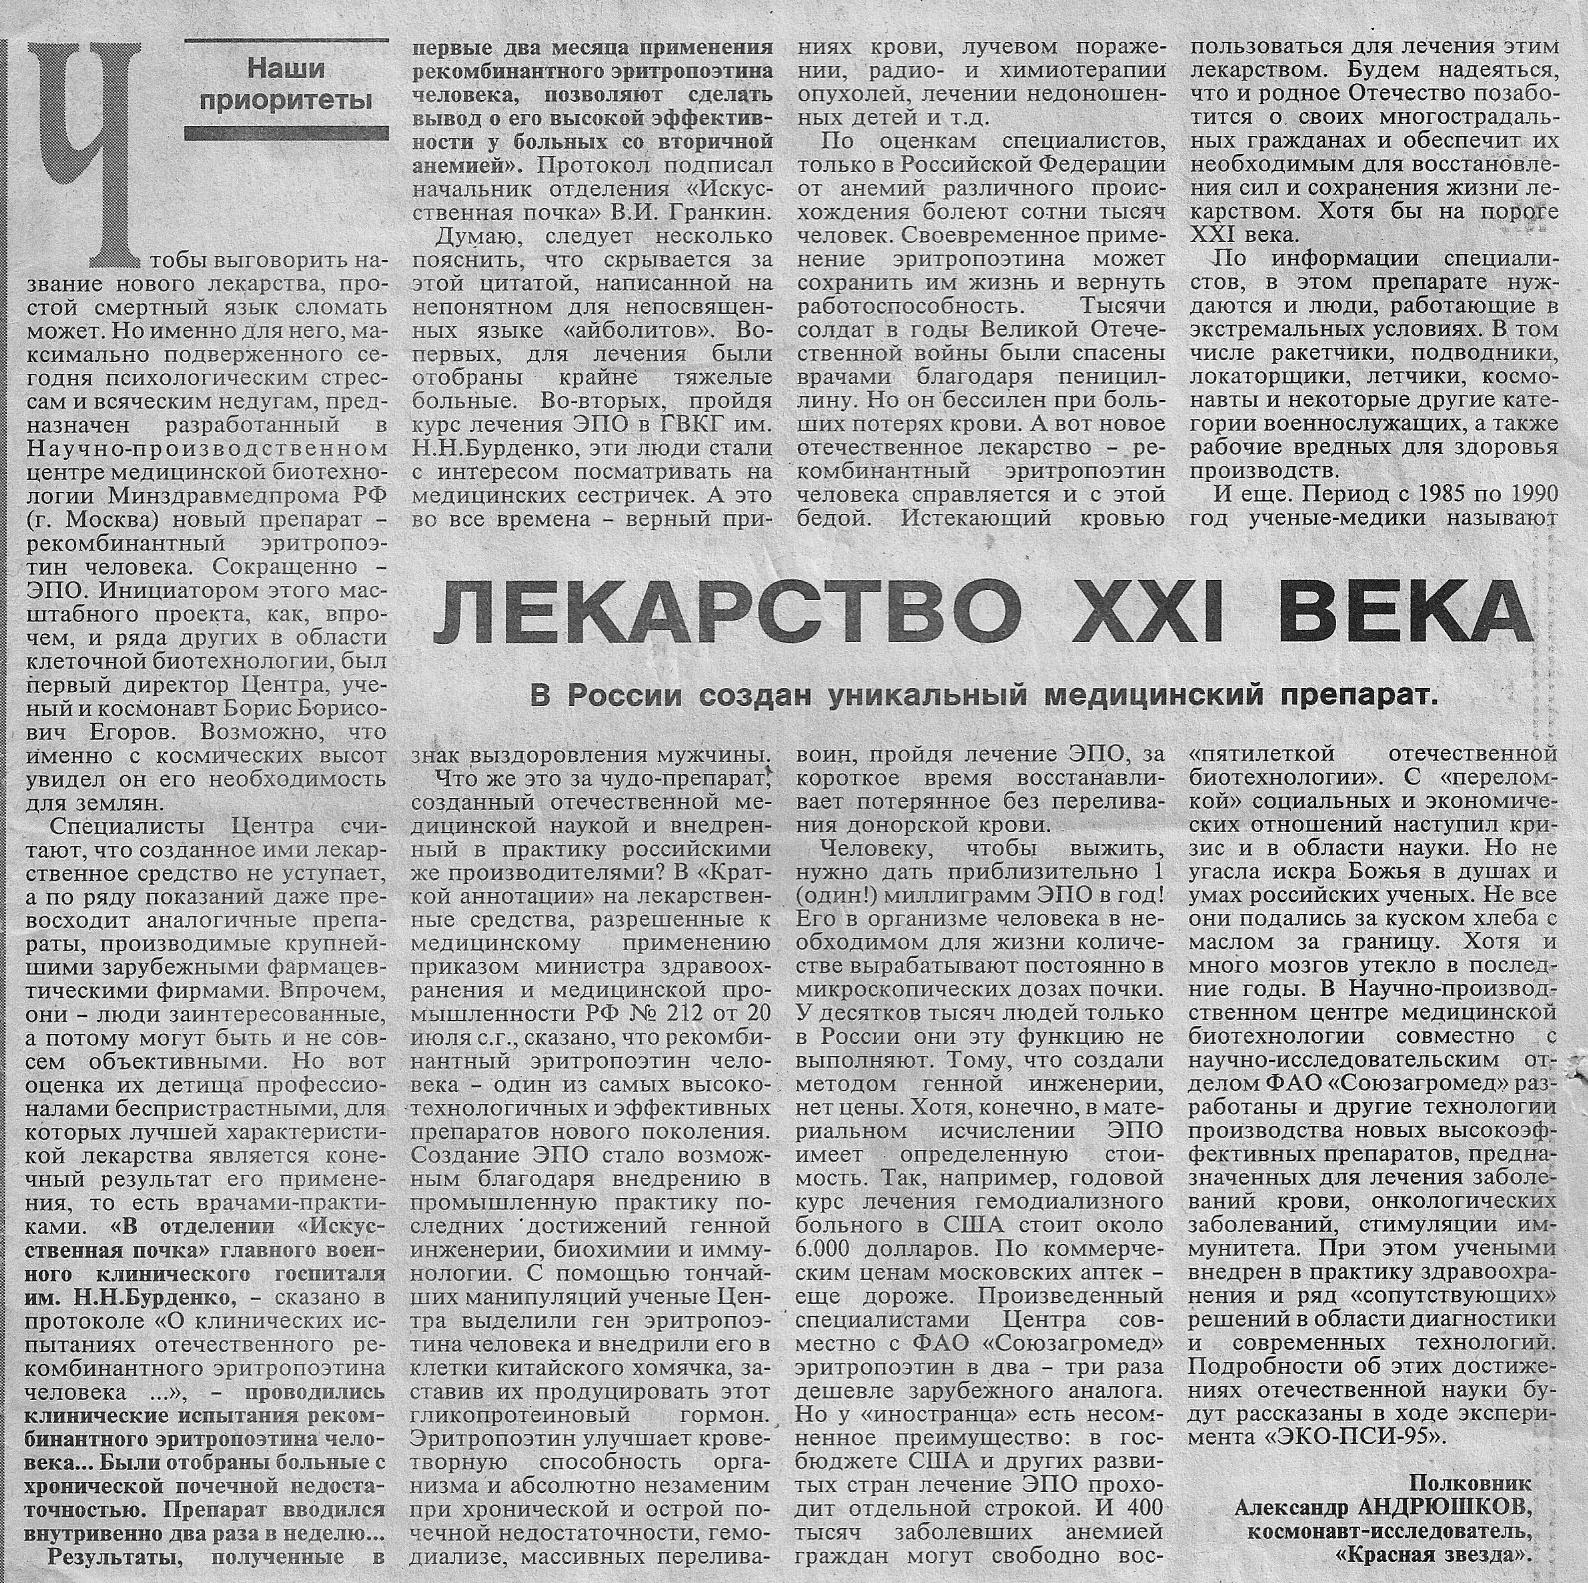 http://s5.uploads.ru/YpKva.jpg